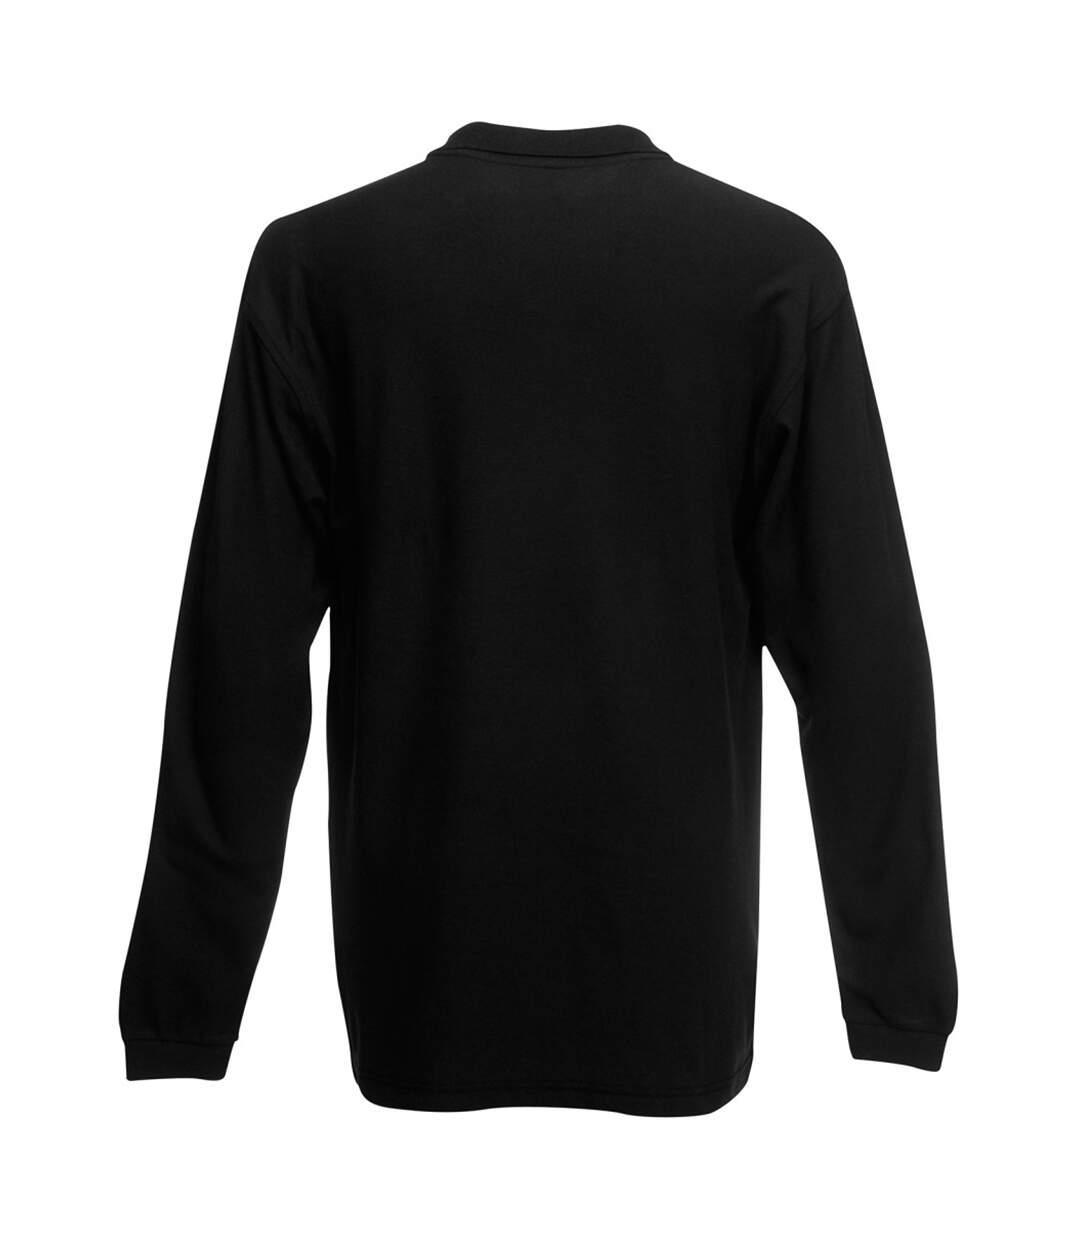 Fruit Of The Loom Mens Premium Long Sleeve Polo Shirt (Black) - UTBC1383